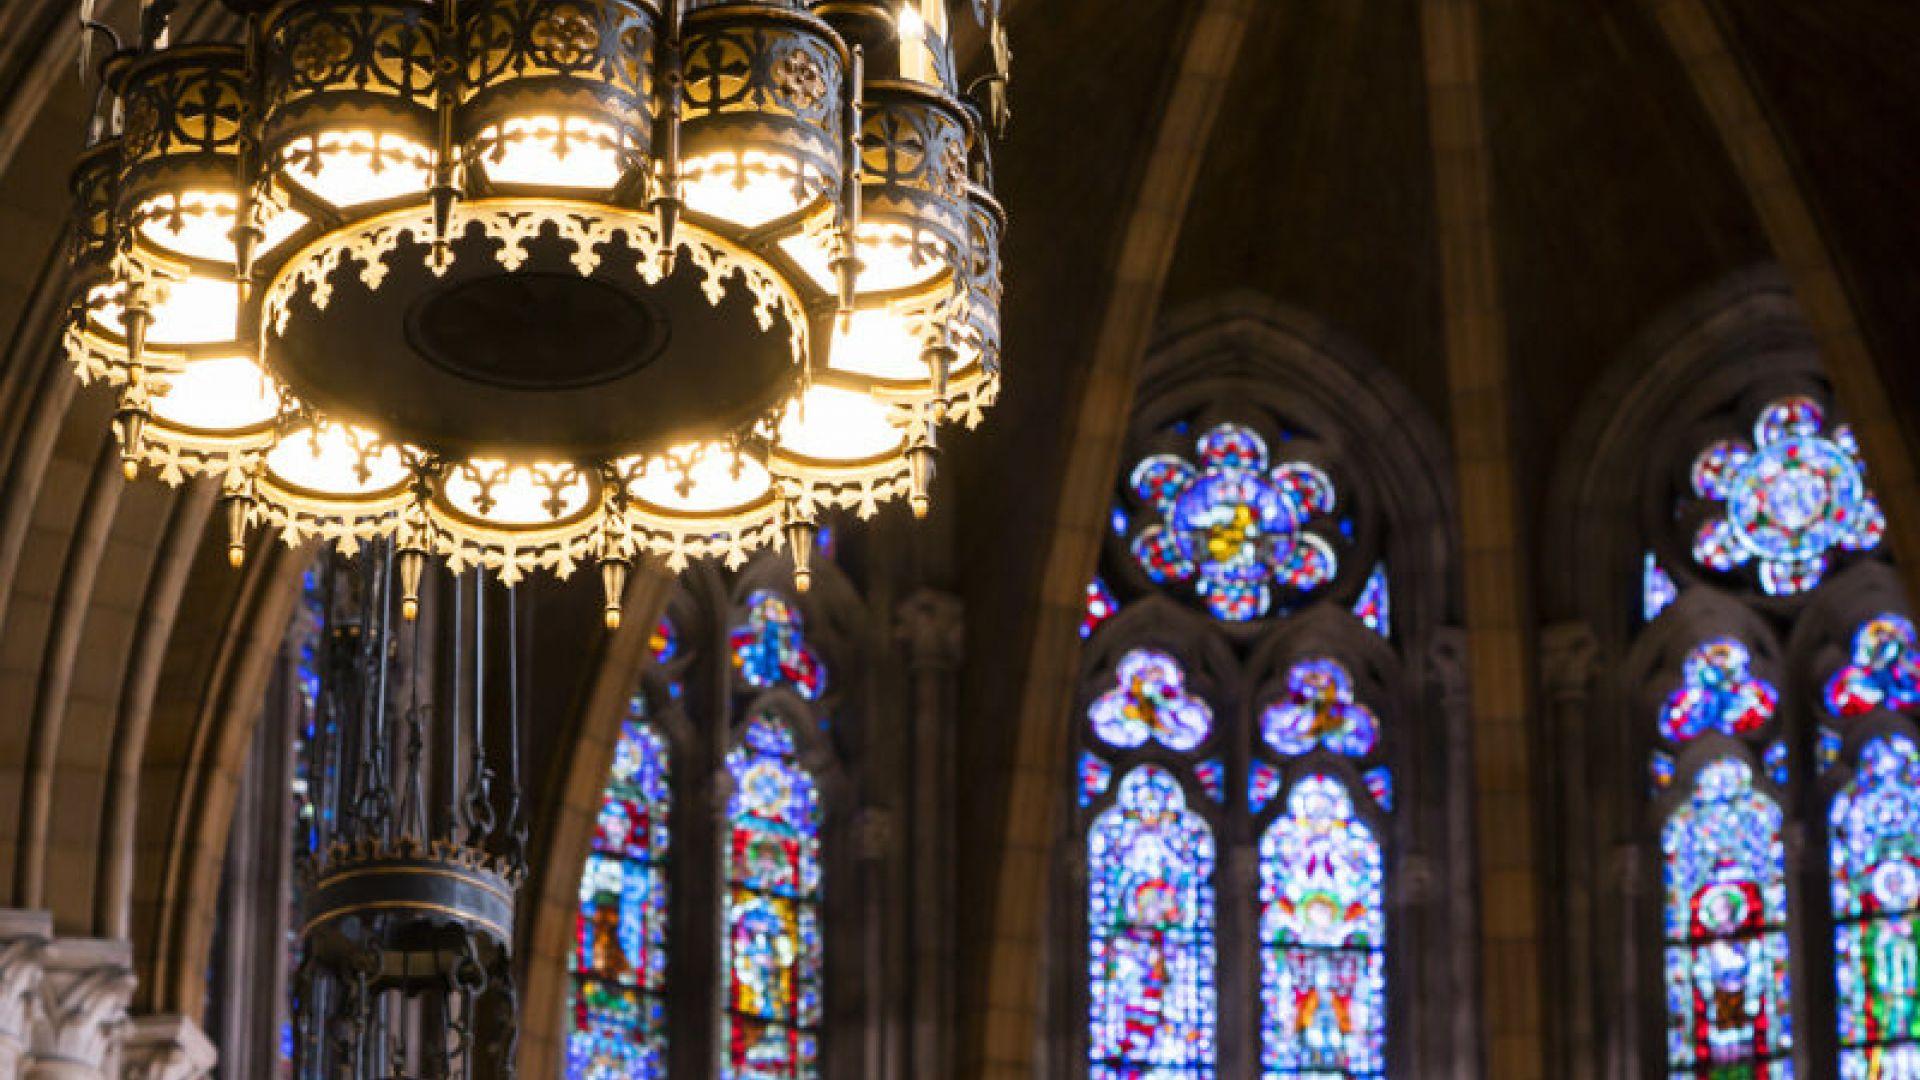 Riverside Church photo by Chris Lee